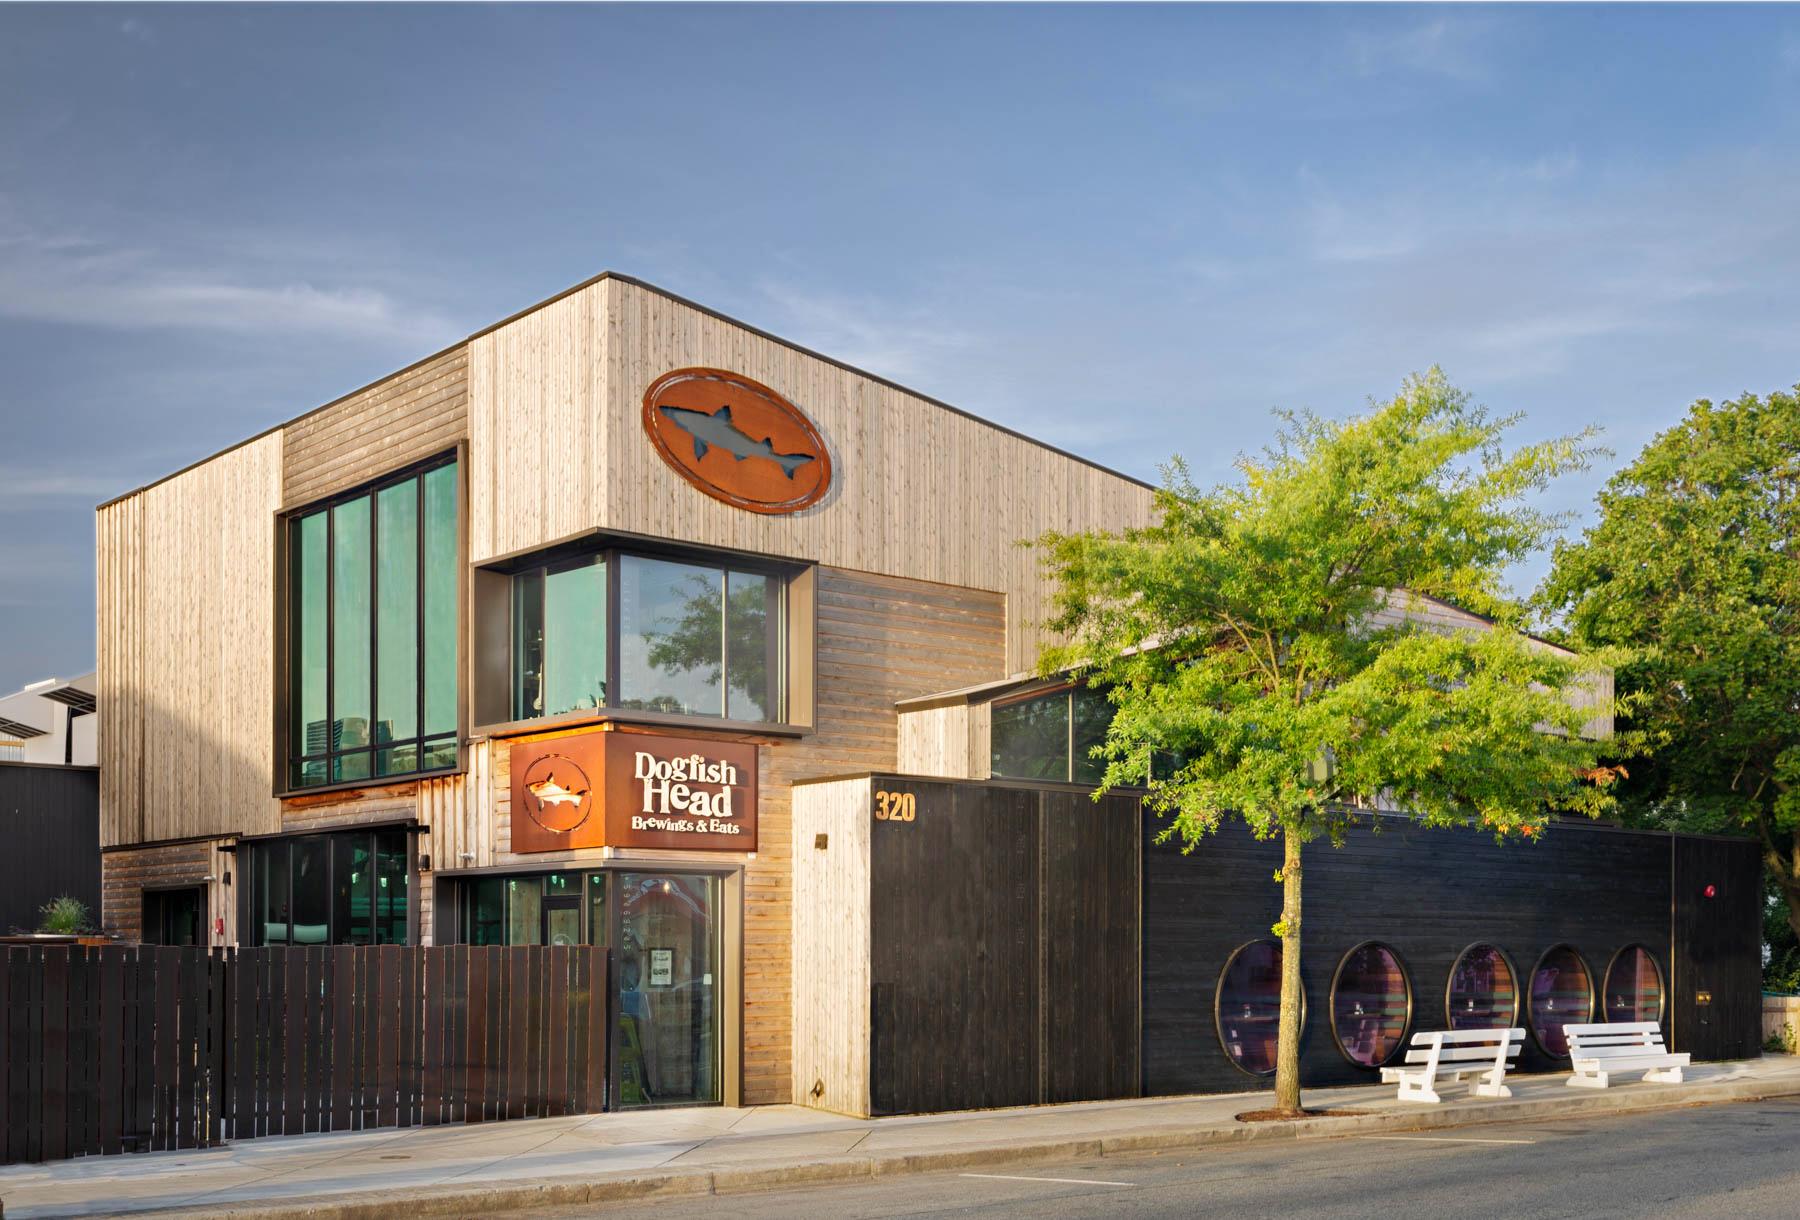 Dogfish-Head-brewery-1.jpg